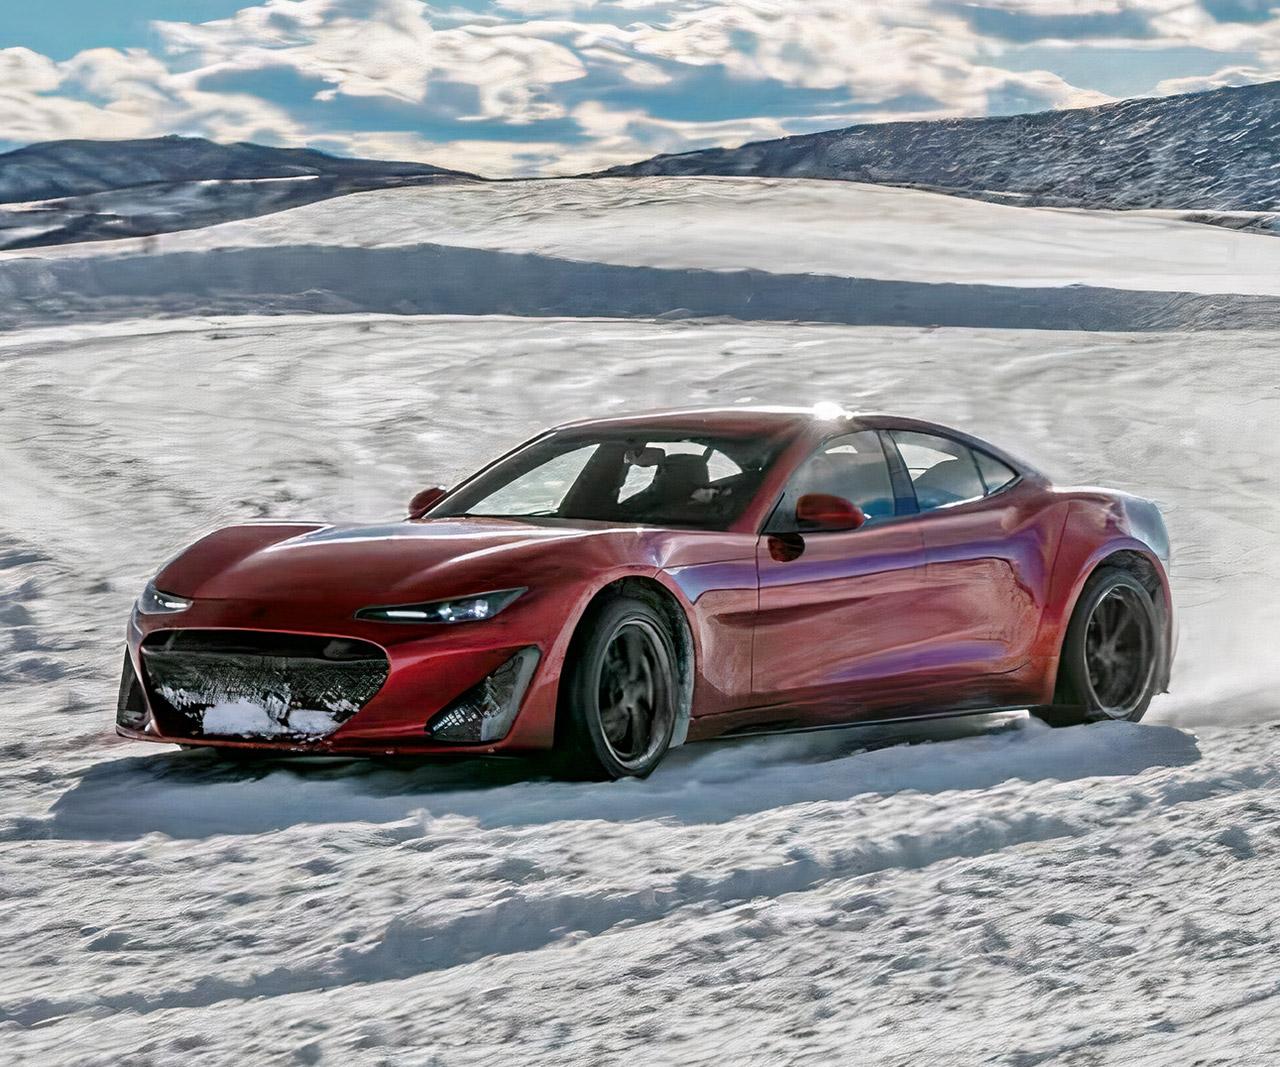 Drako GTE Electric Hypercar Ice Snow